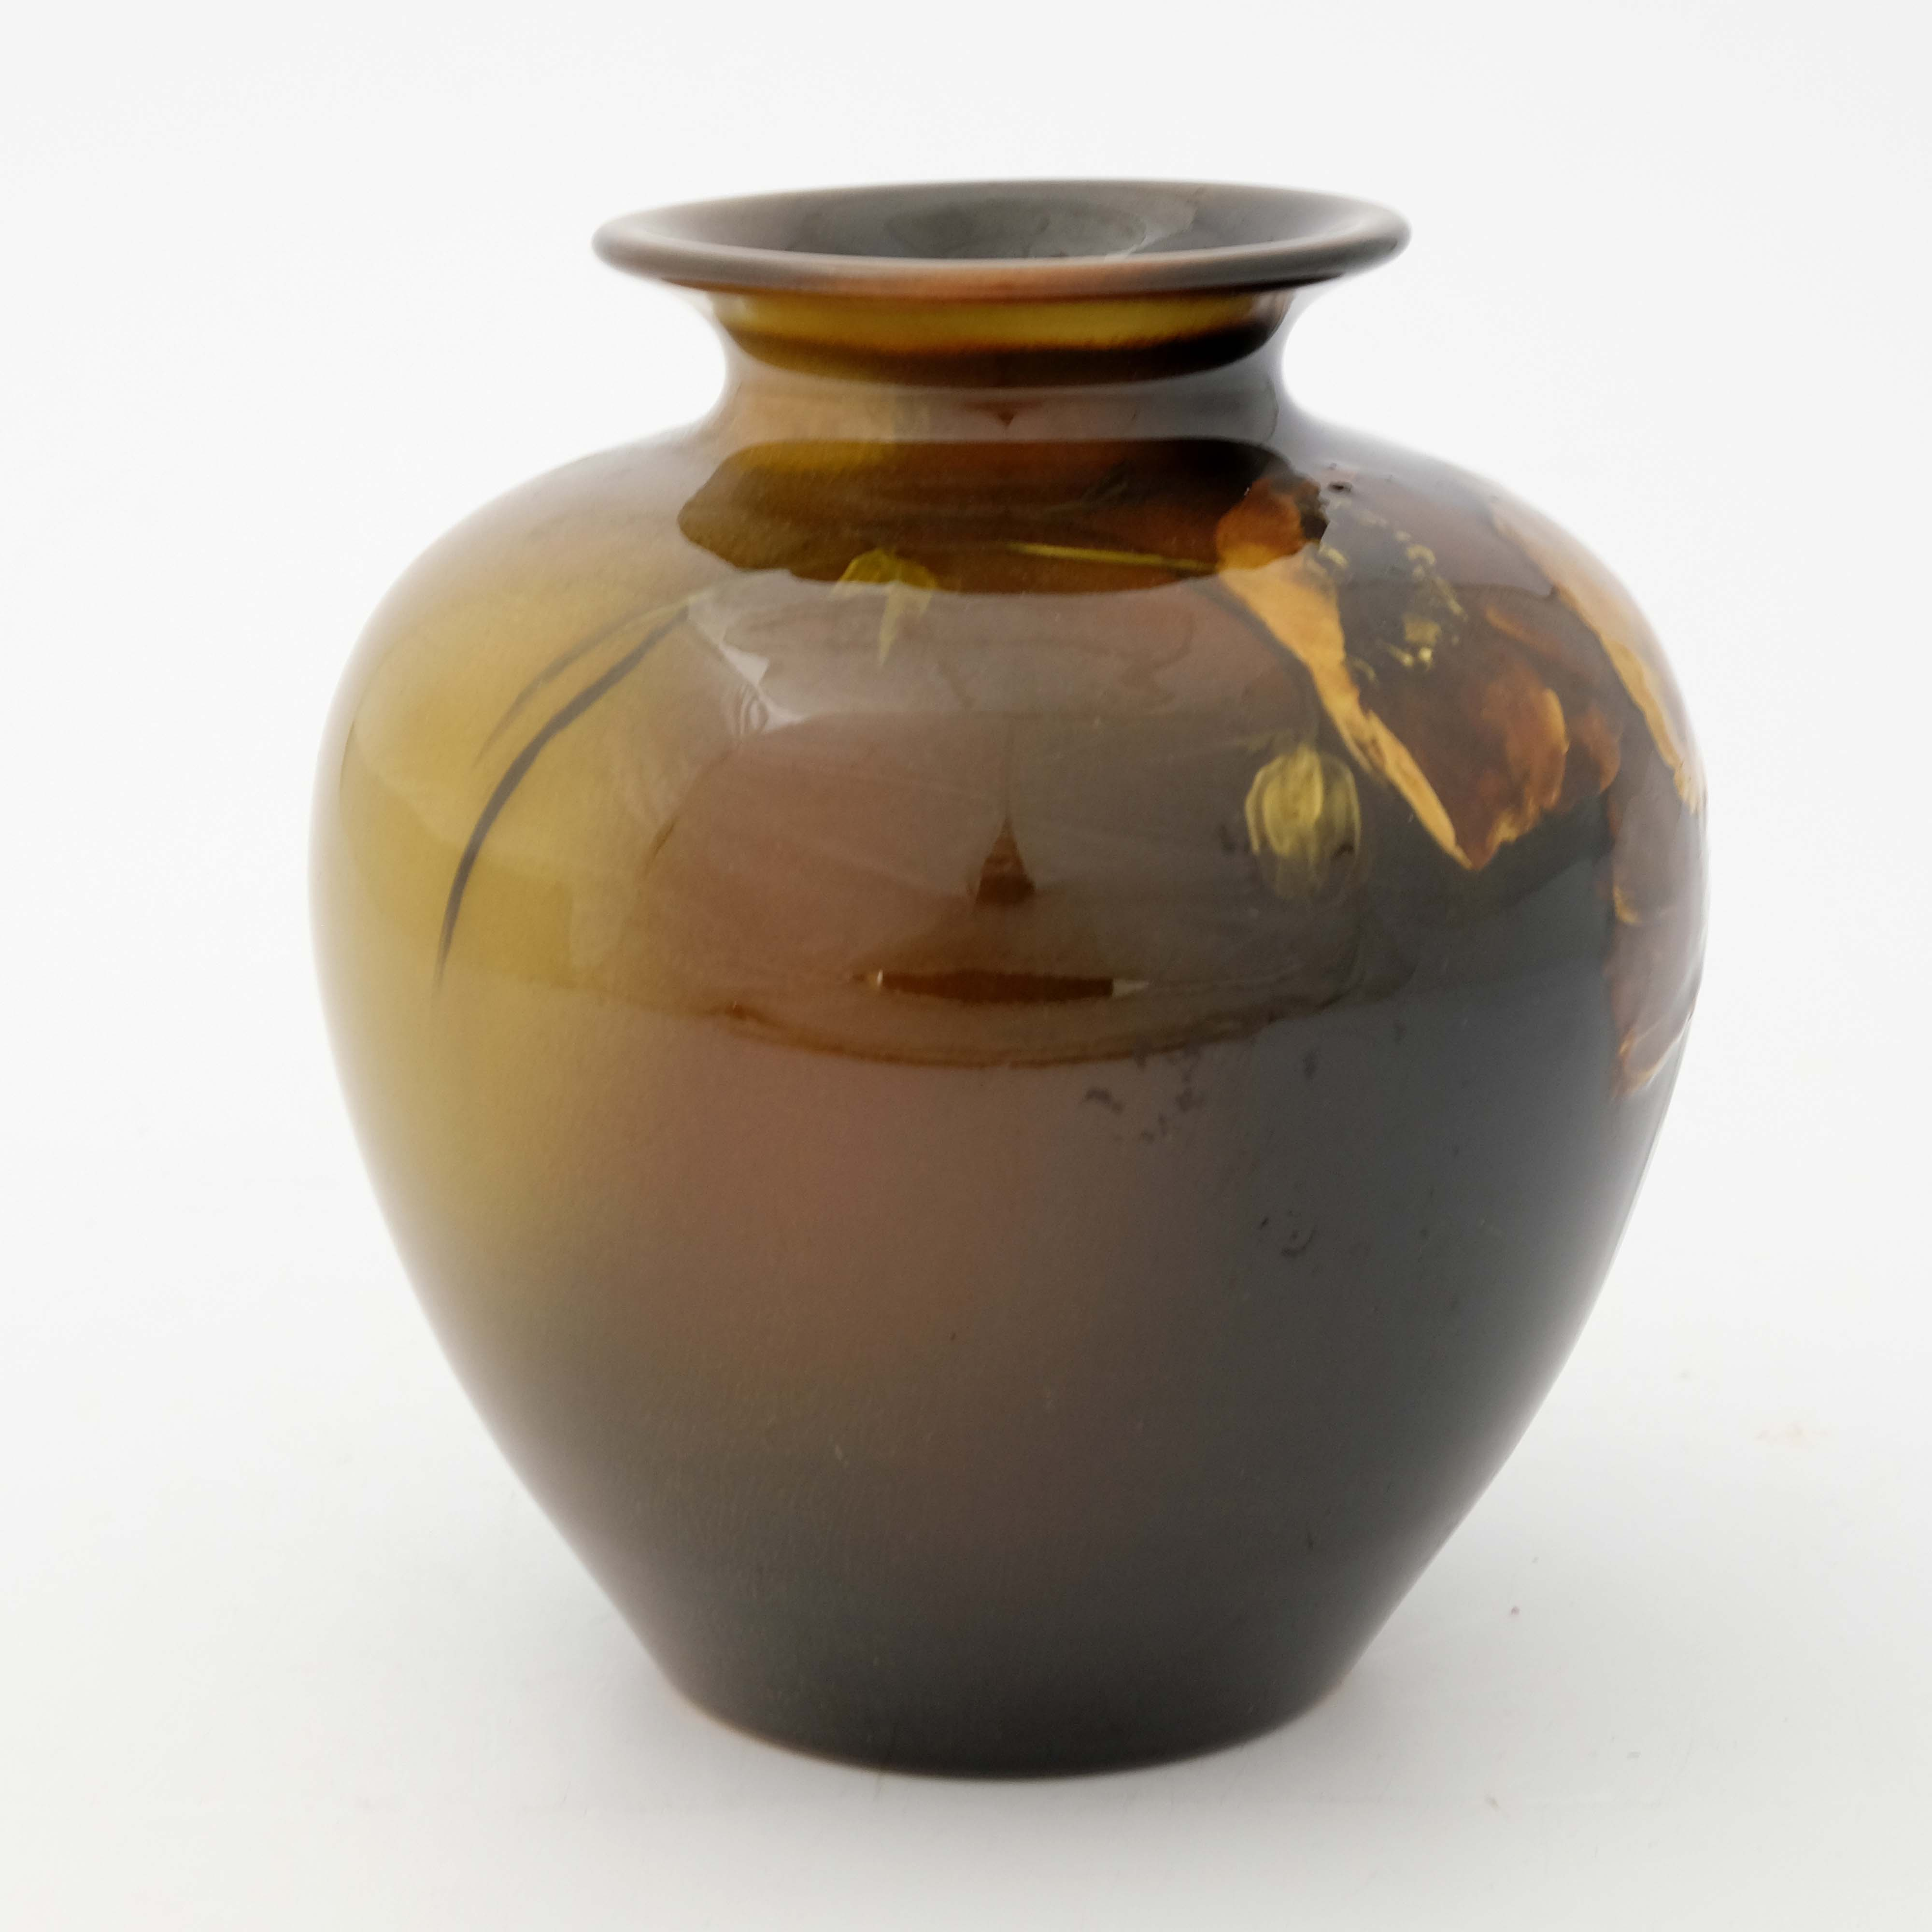 Amelia Sprague for Rookwood Pottery, a slip decora - Image 3 of 5